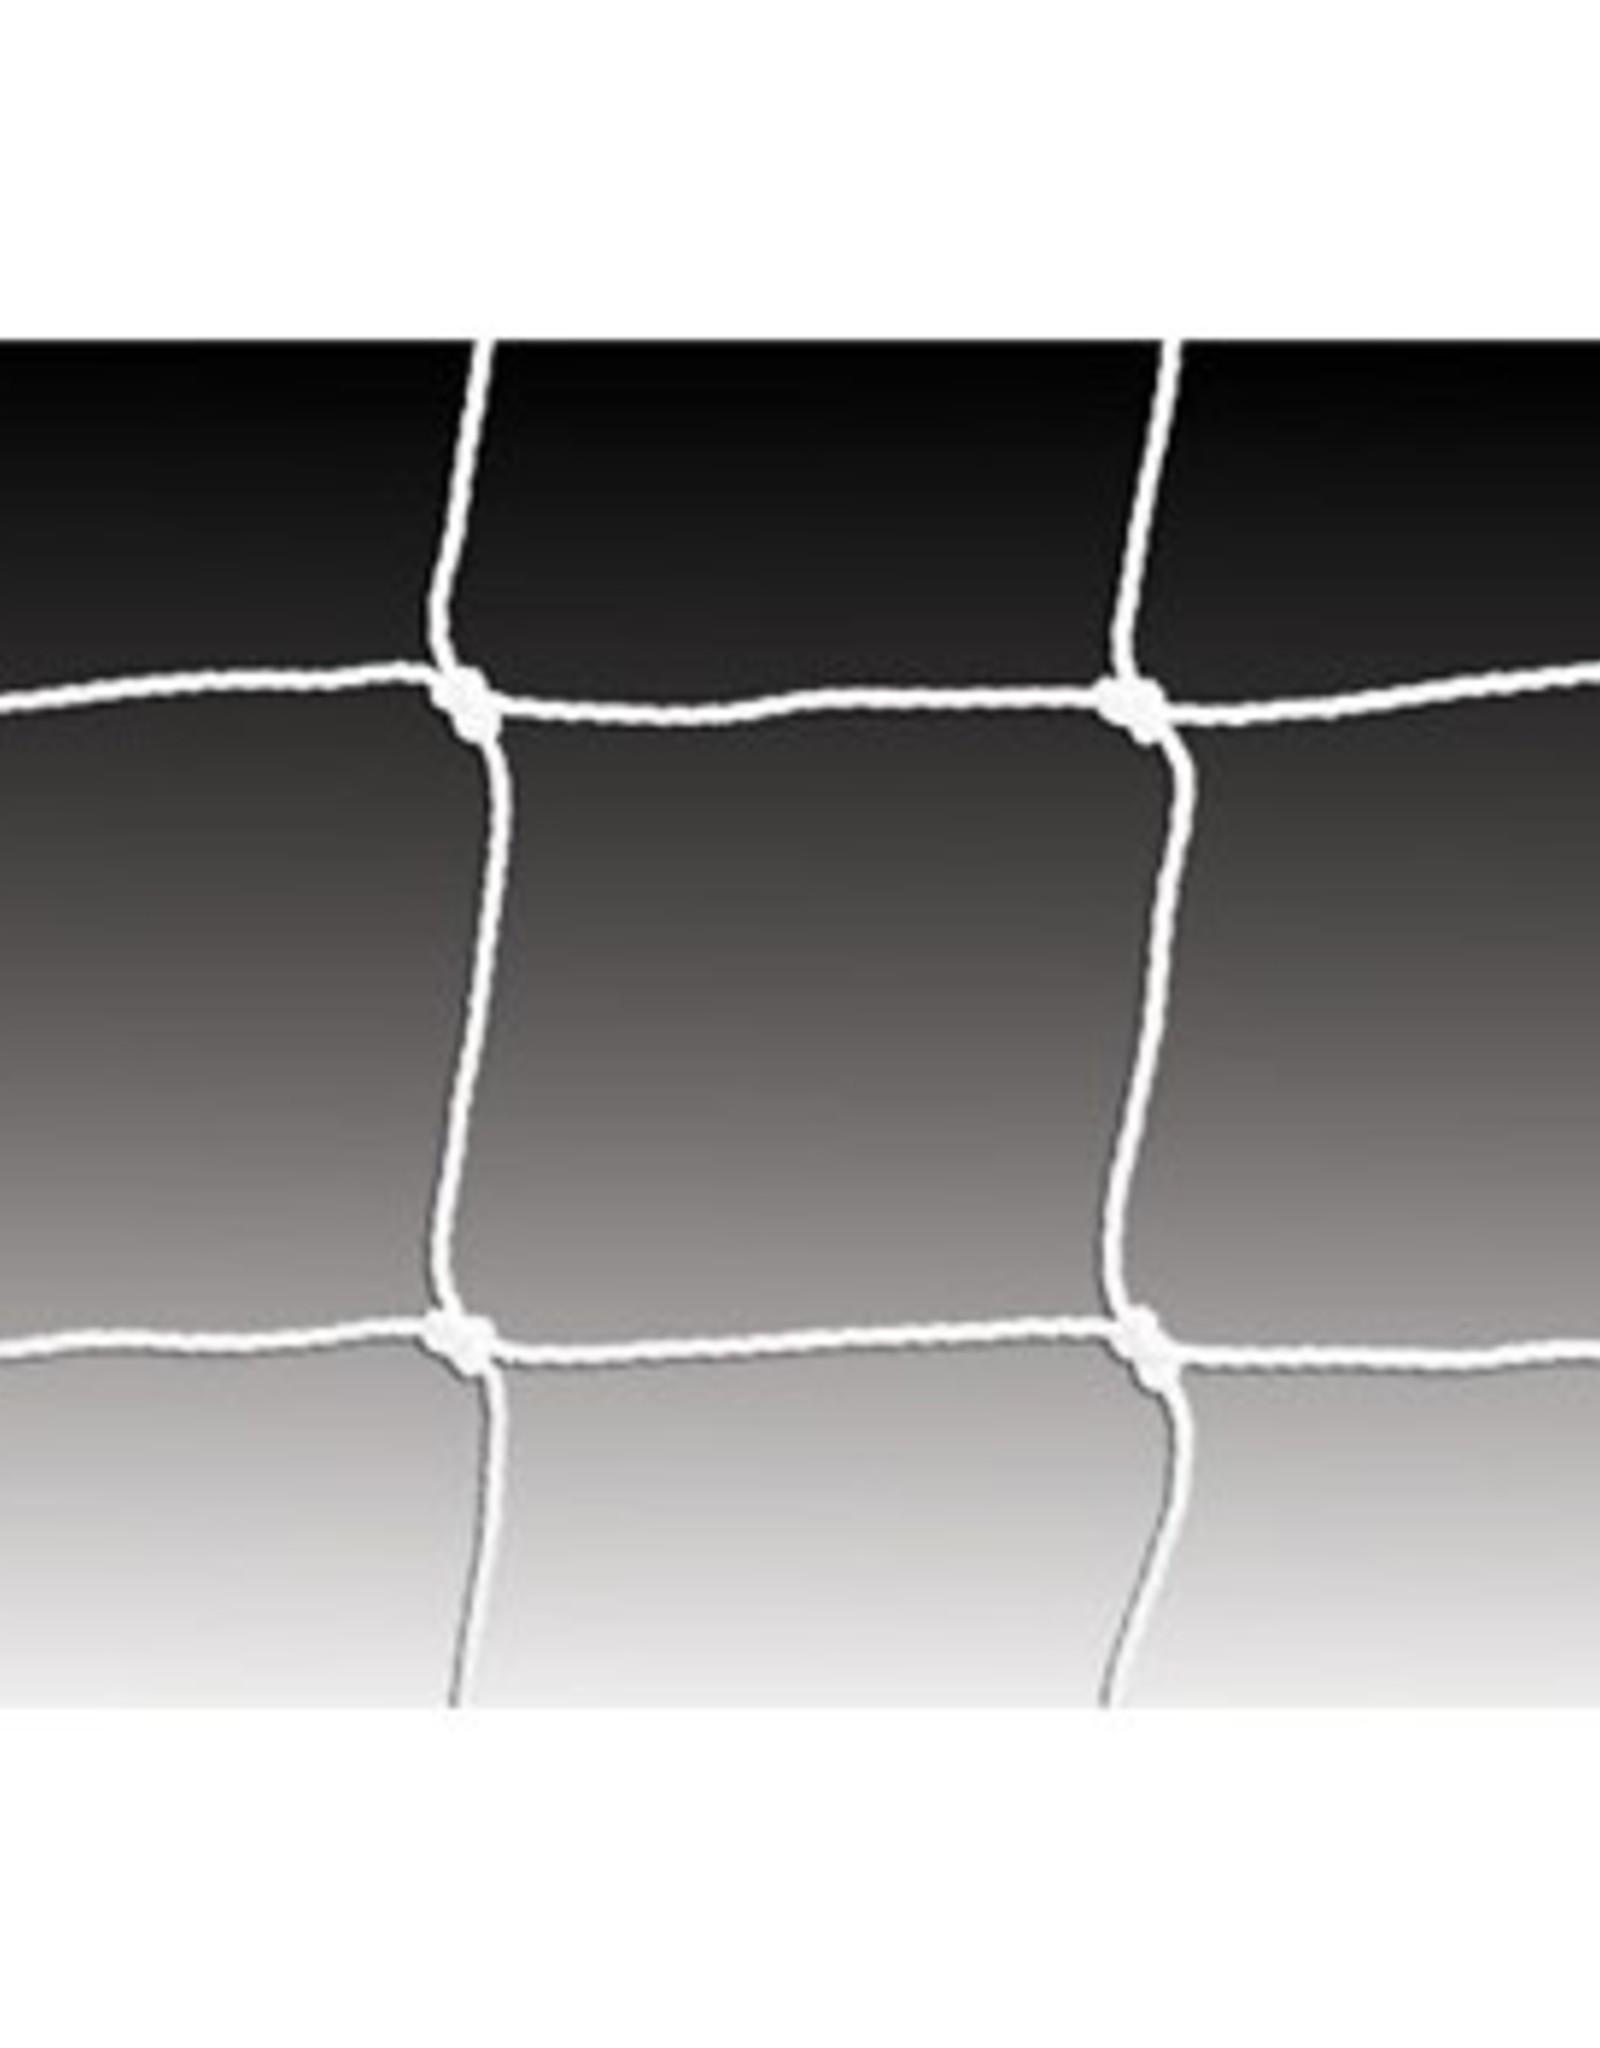 Kwik Goal Kwik Goal 7'H x 21'W x 3'D x 7.5'B Soccer Net